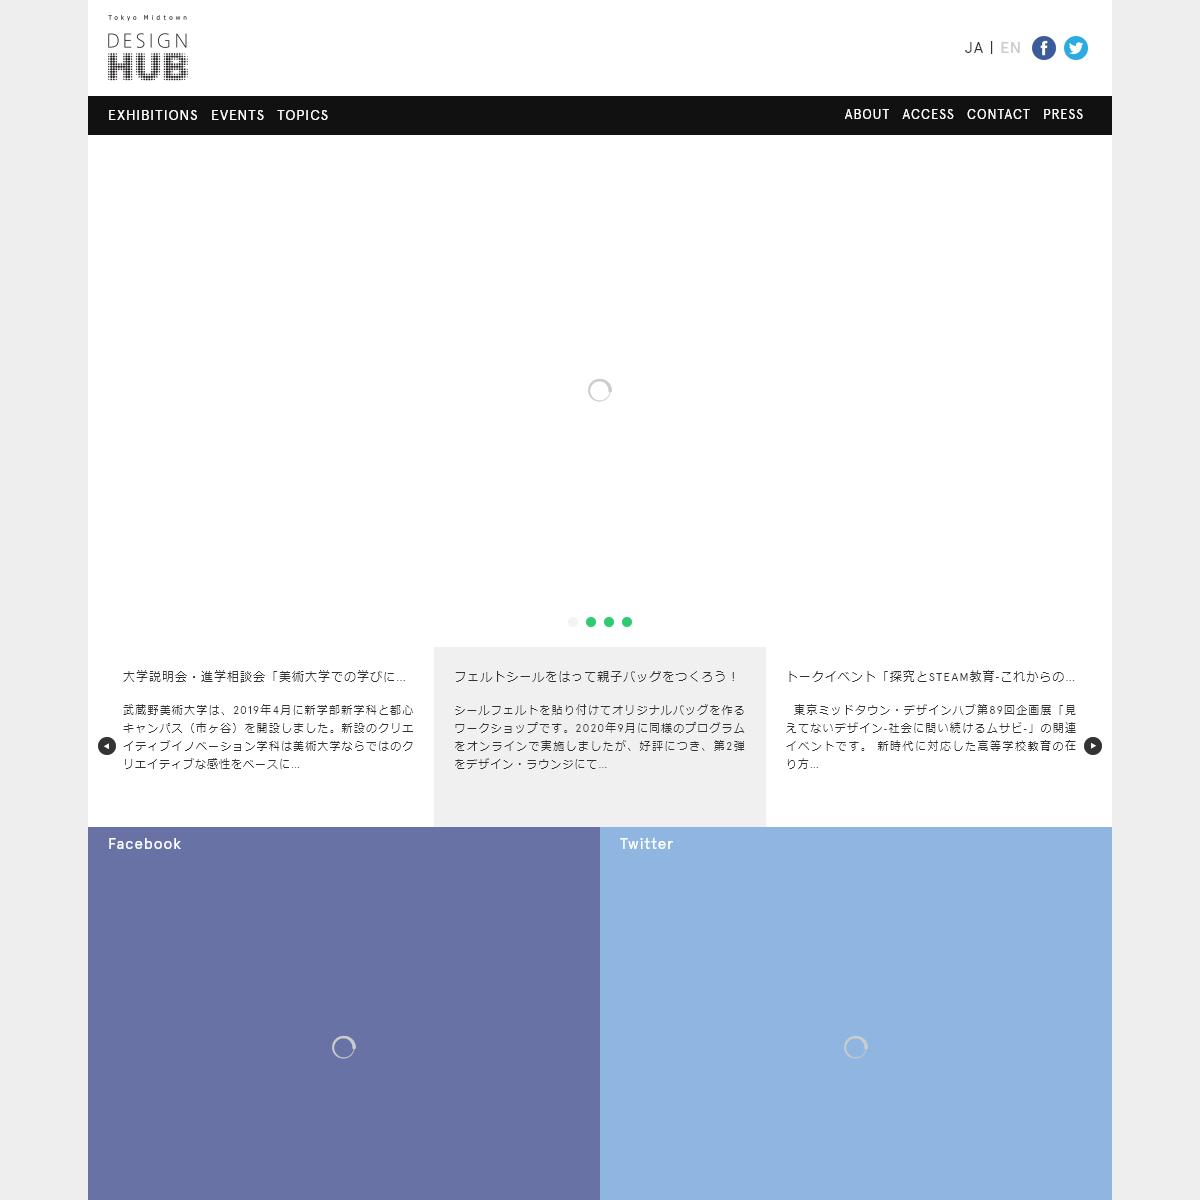 Tokyo Midtown Design Hub - 東京ミッドタウン・デザインハブ